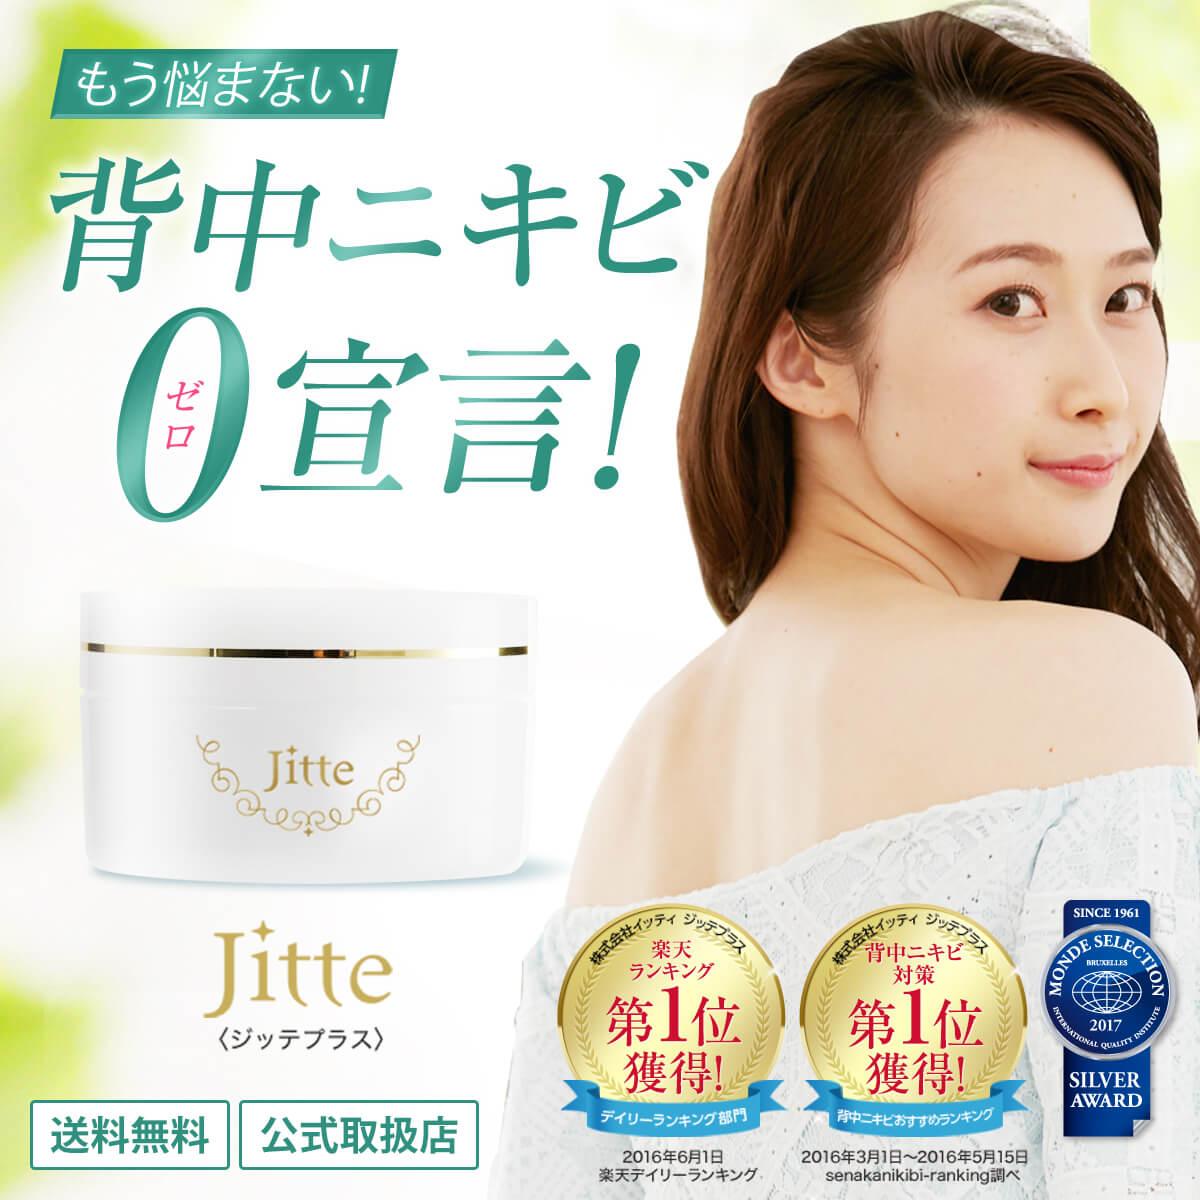 Jitte+(ジッテプラス)【送料無料】【ポイント10倍】